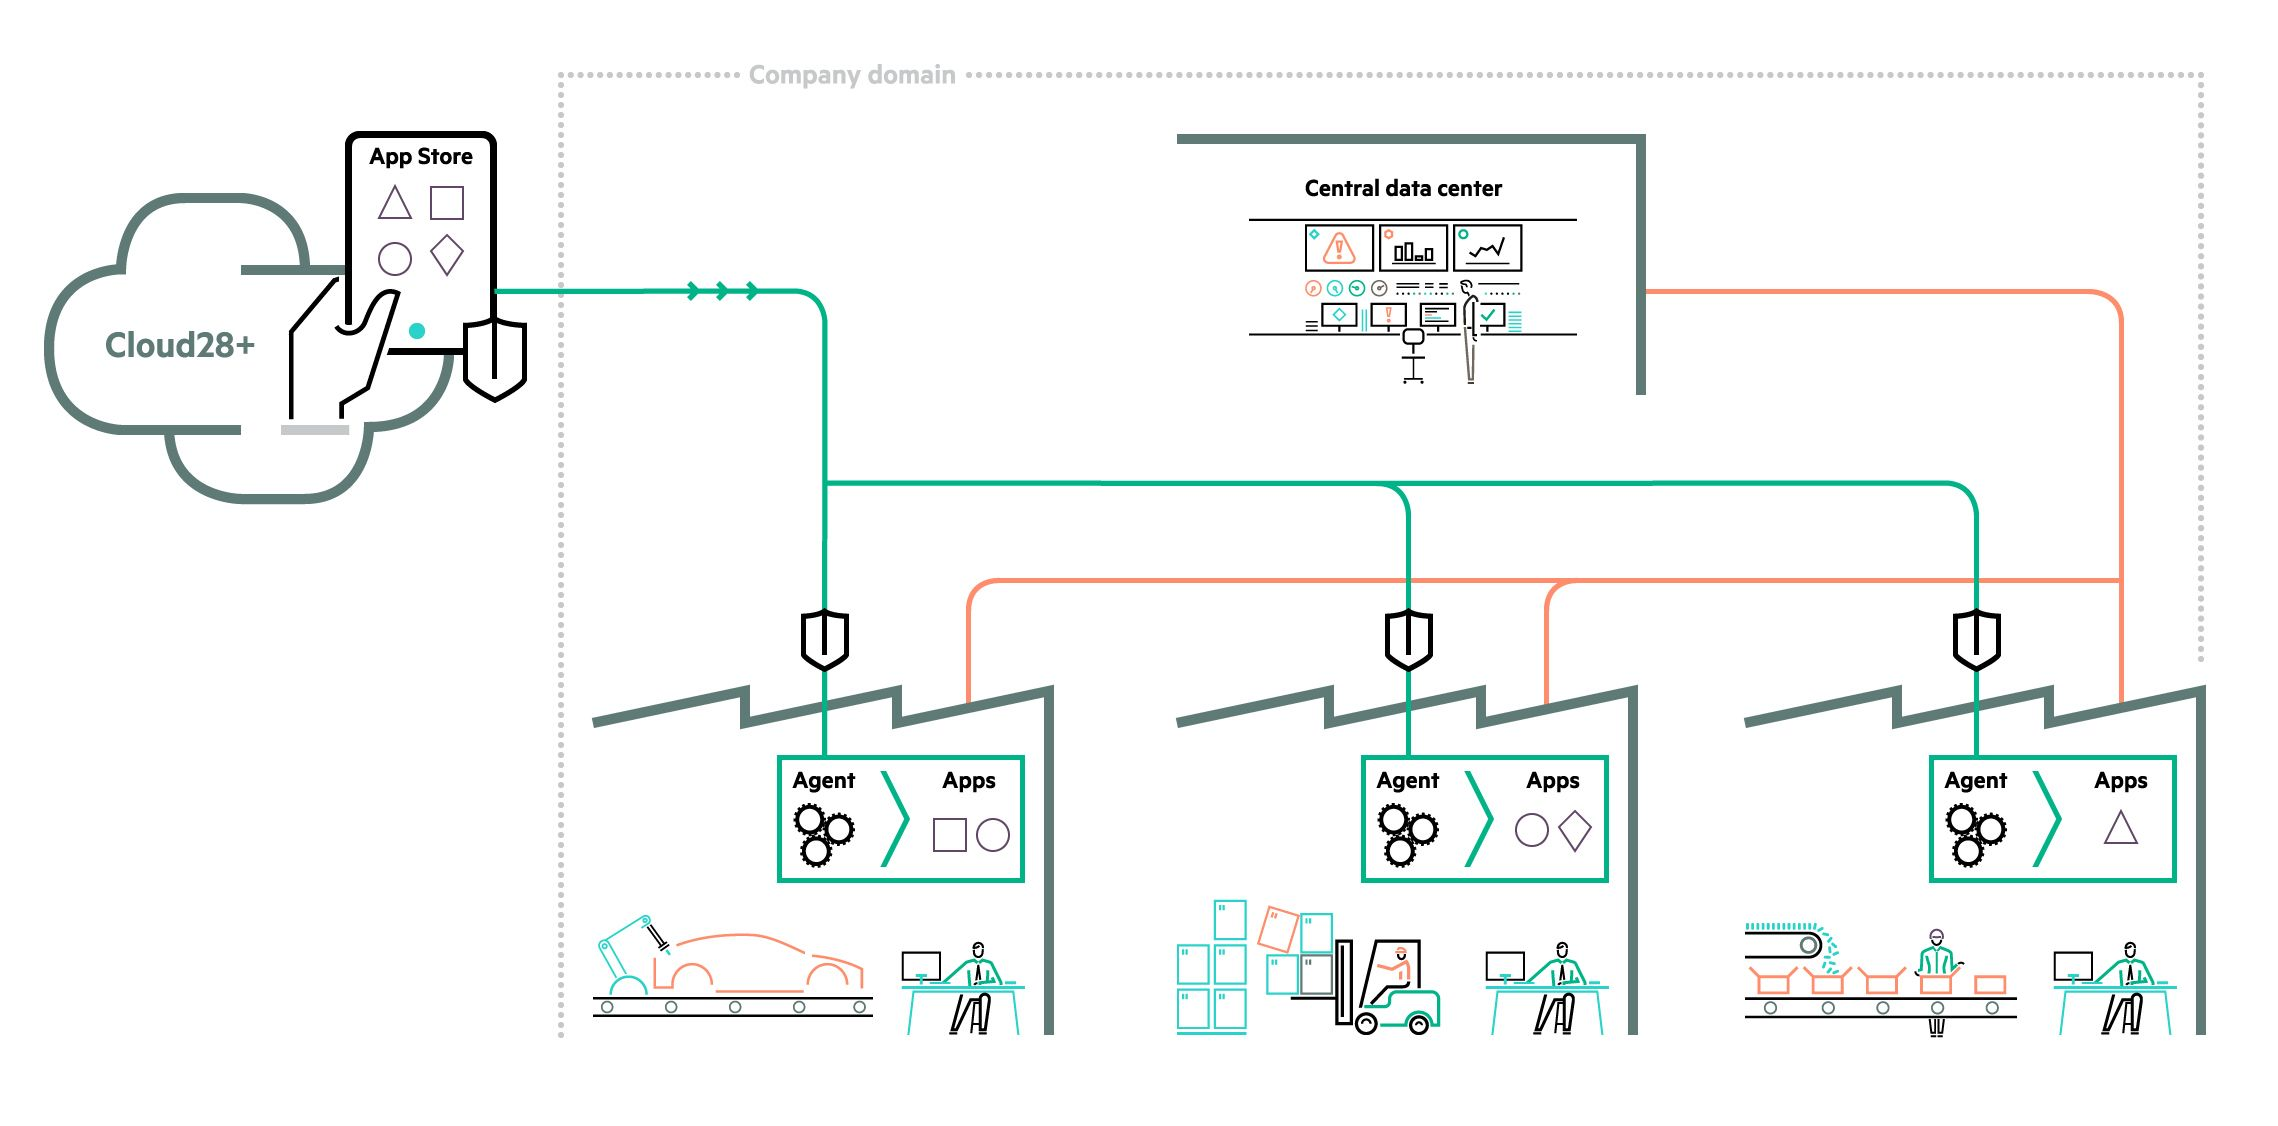 hpe_express-app-platform_manufacturing.jpg